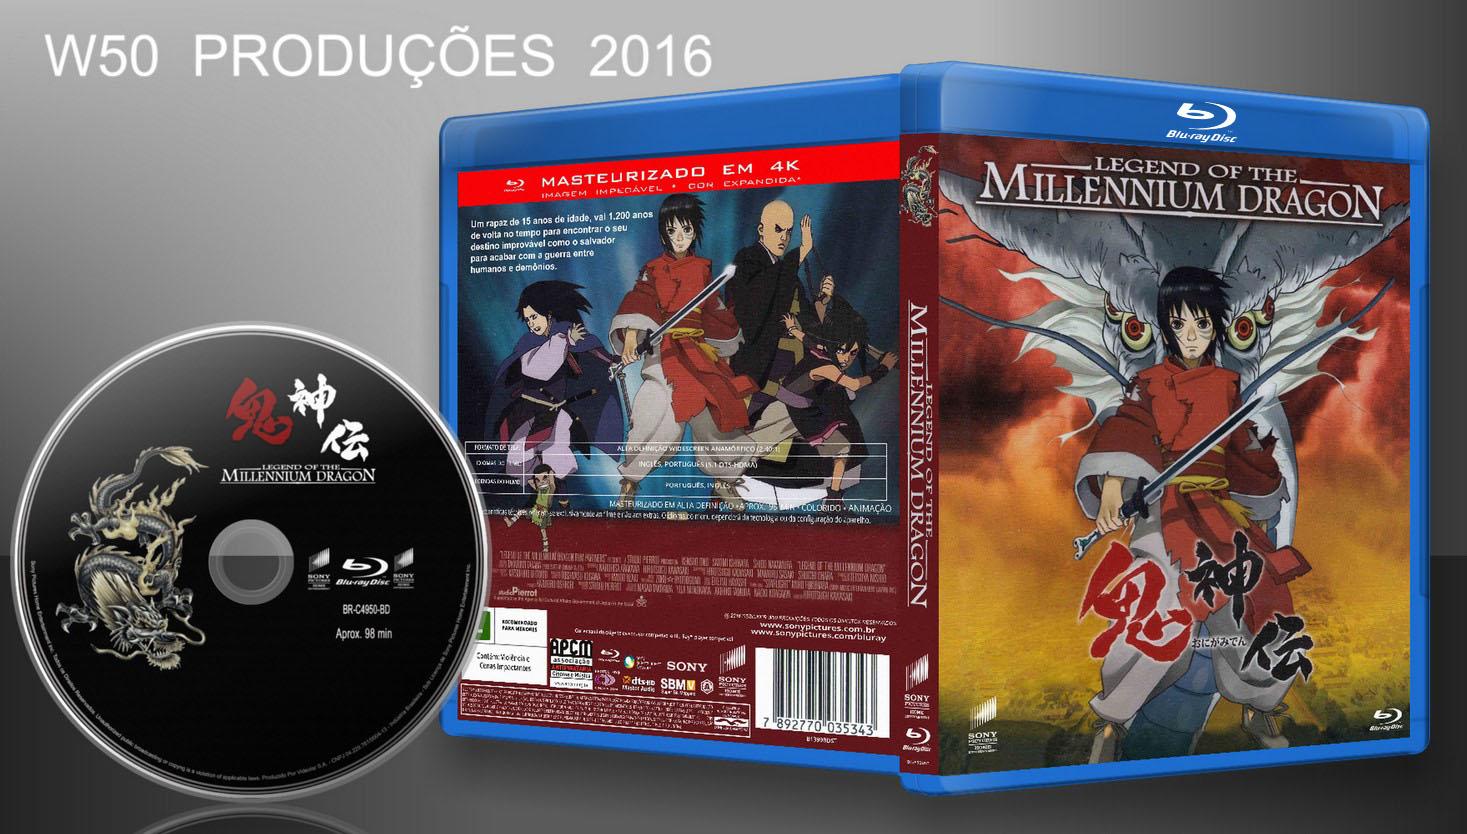 w50 produ es cds dvds blu ray legend of the millennium dragon blu ray lan amento 2016. Black Bedroom Furniture Sets. Home Design Ideas